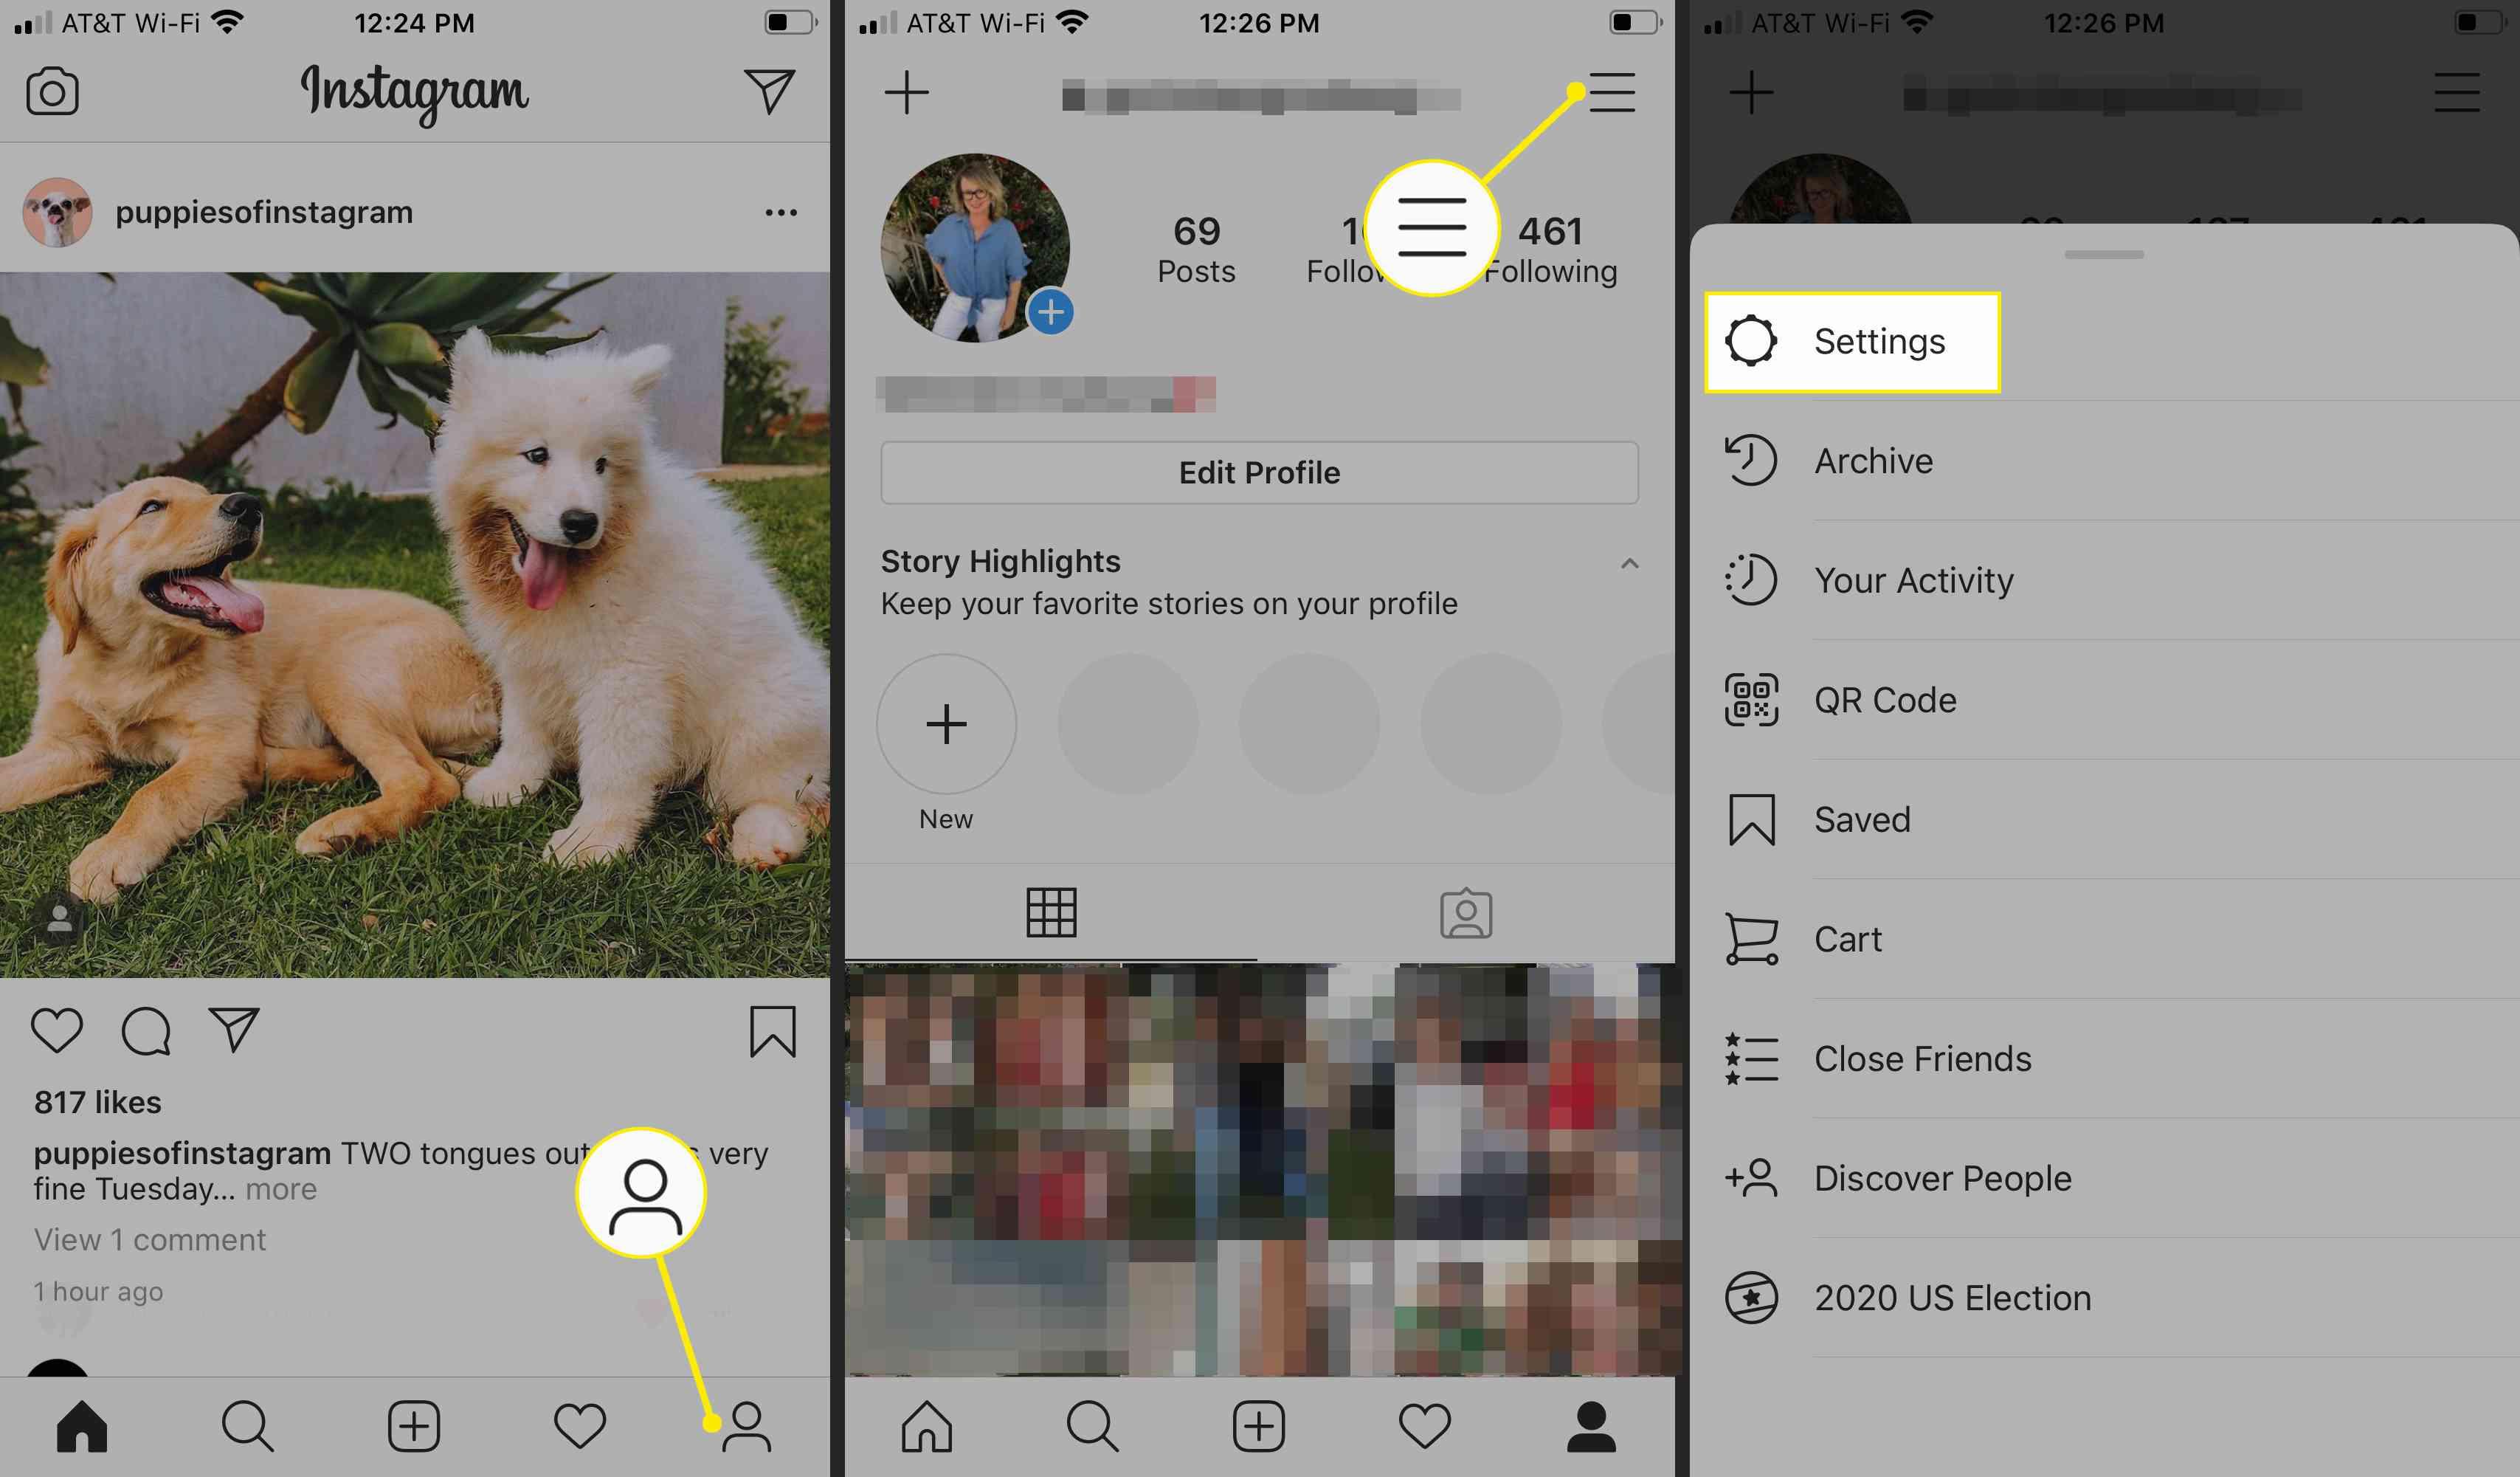 Instagram profile, account, and settings menus on iOS app